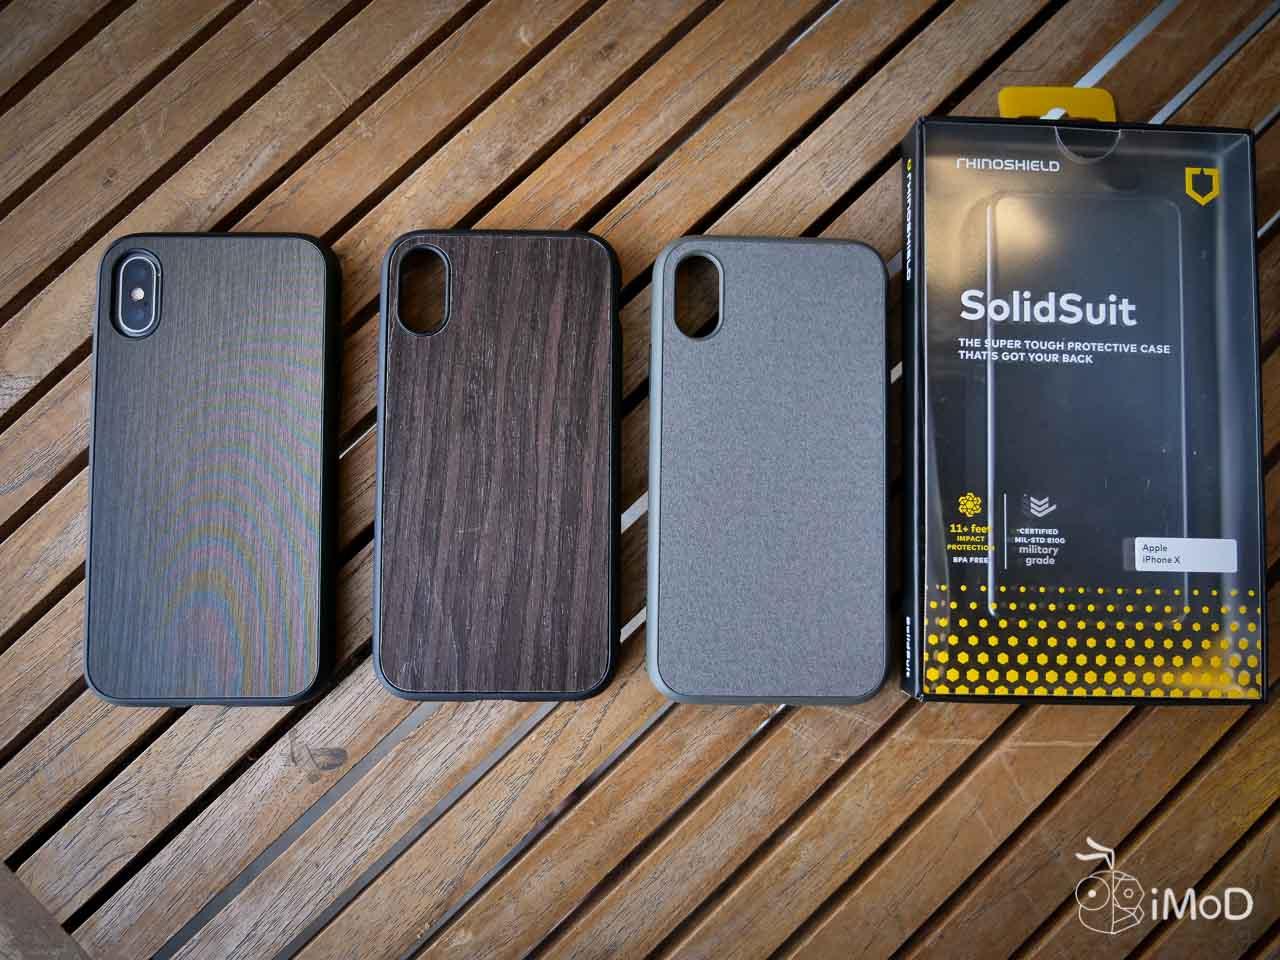 Rhinoshiled Solidsuite Iphonex 12